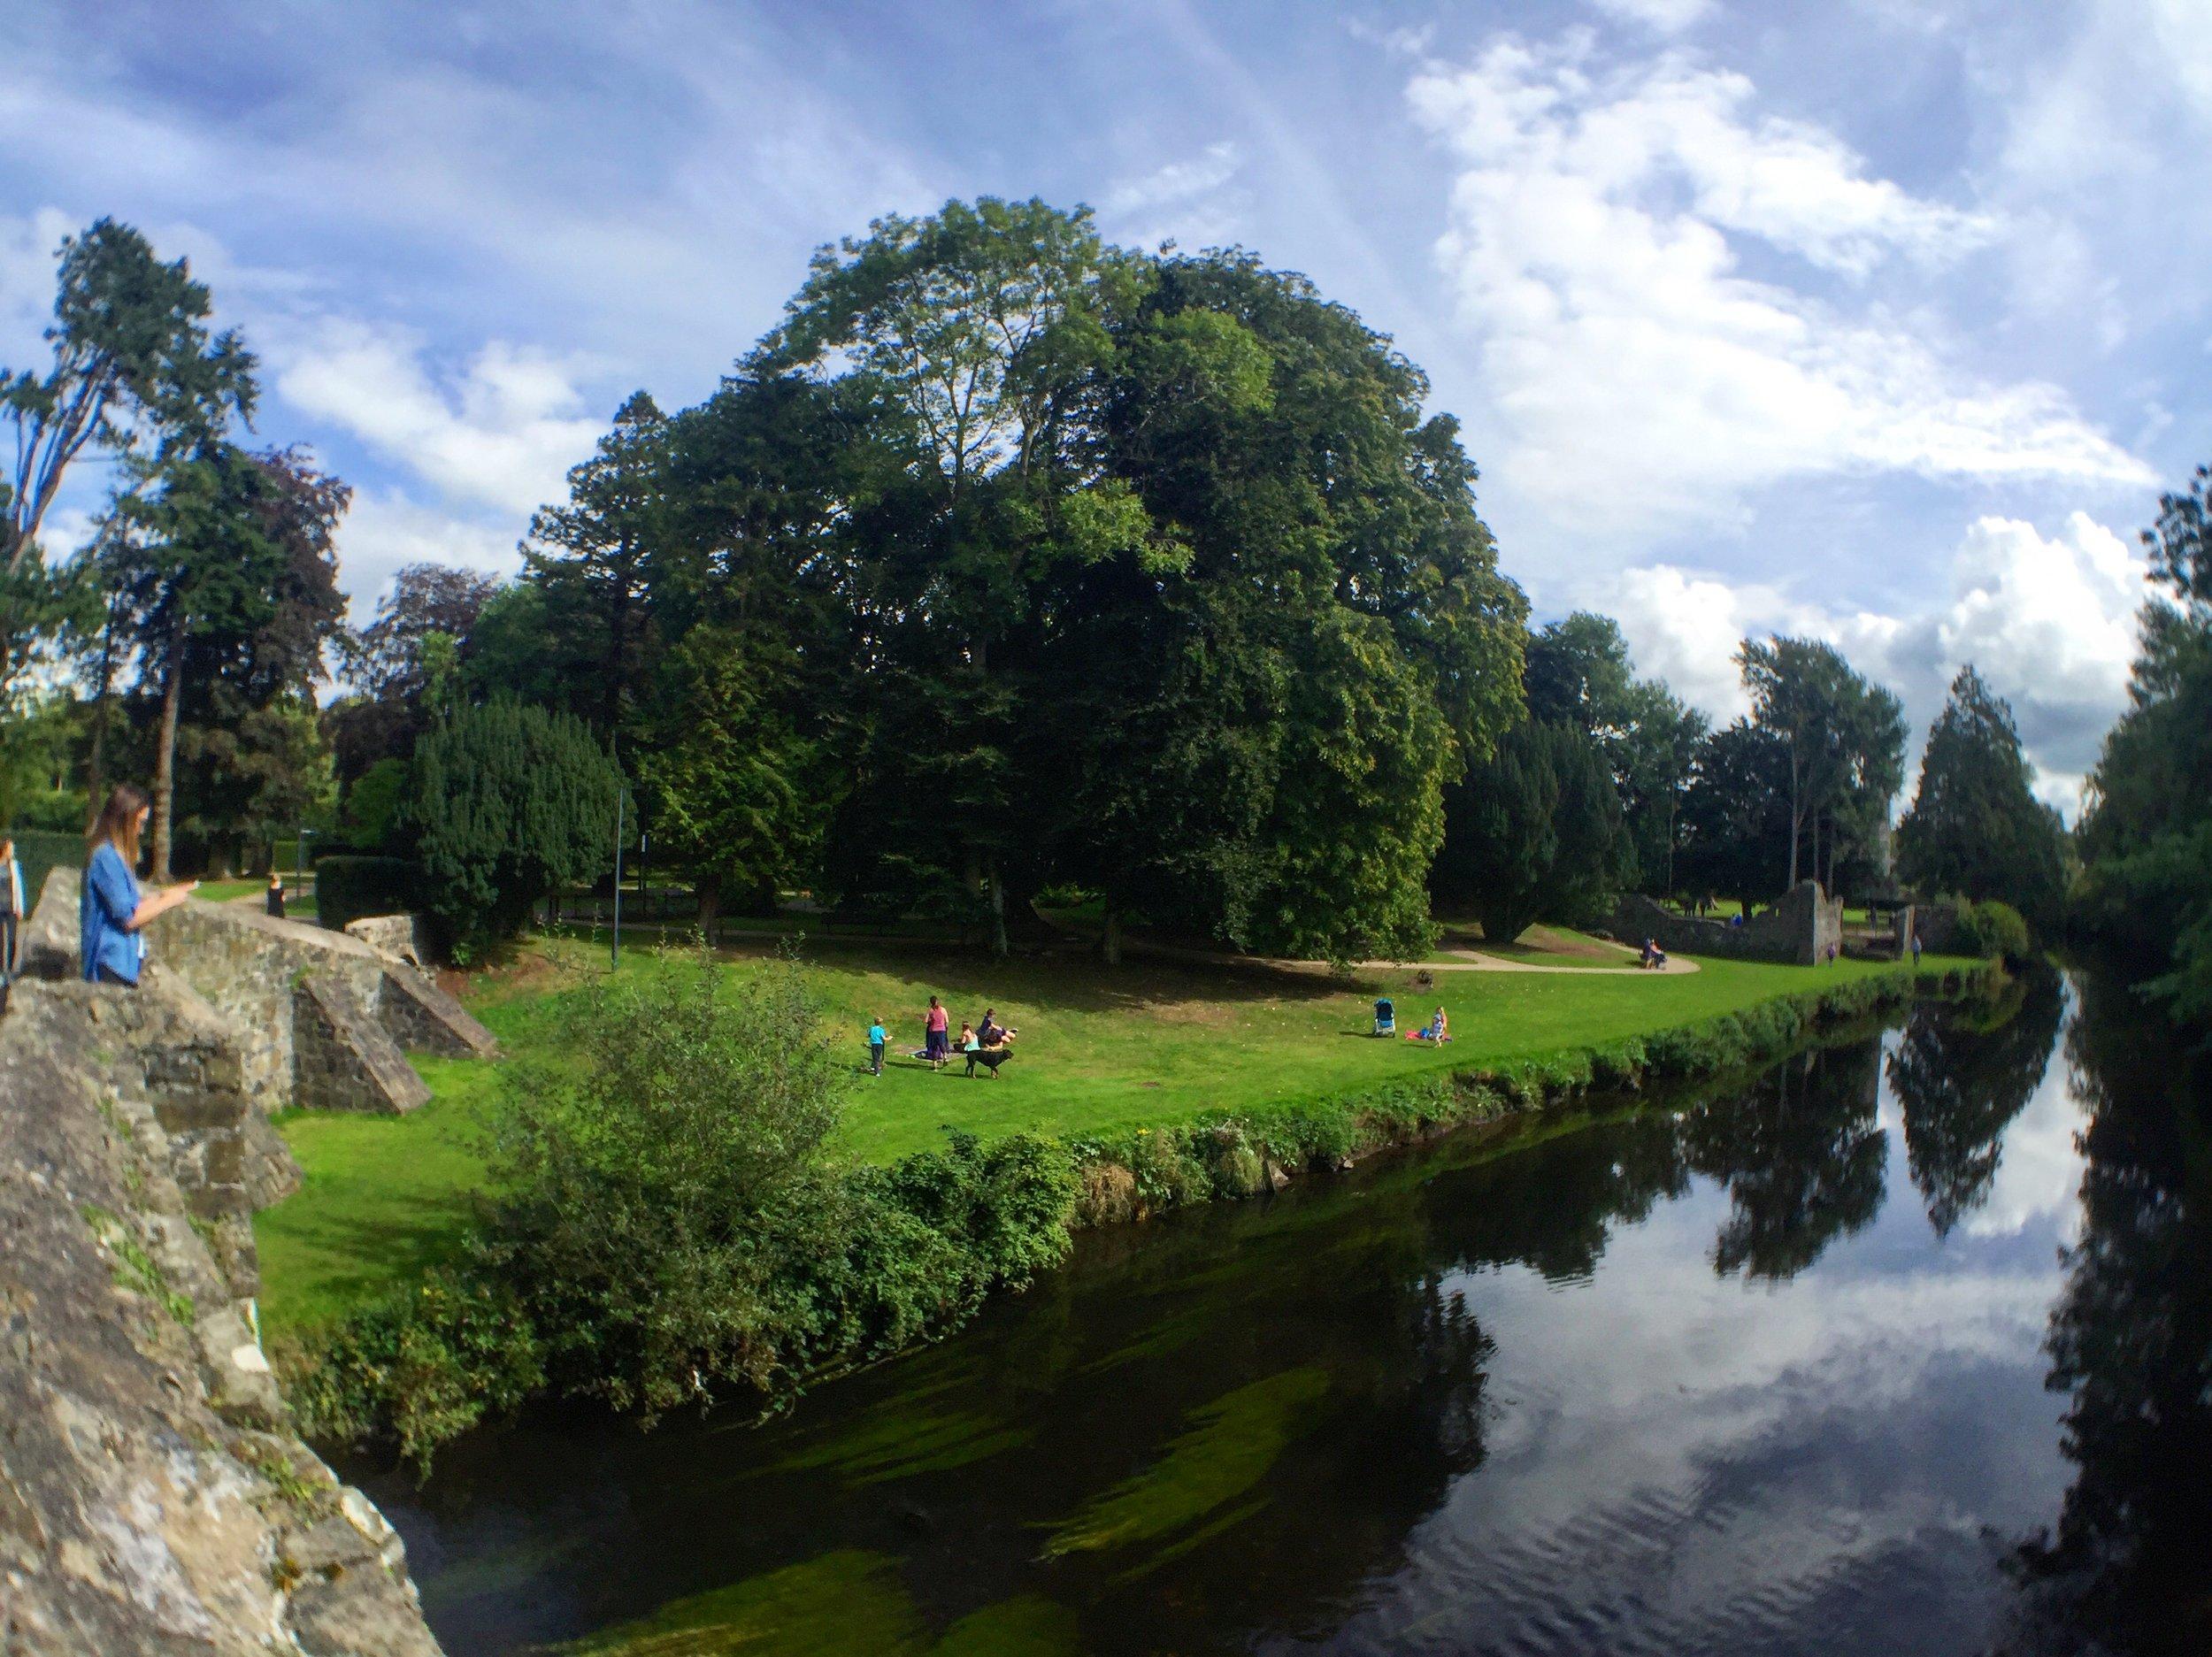 river_Wide_Antrim_castle_gardens_antrim_northern_ireland_ni_explorer_niexplorer.jpg